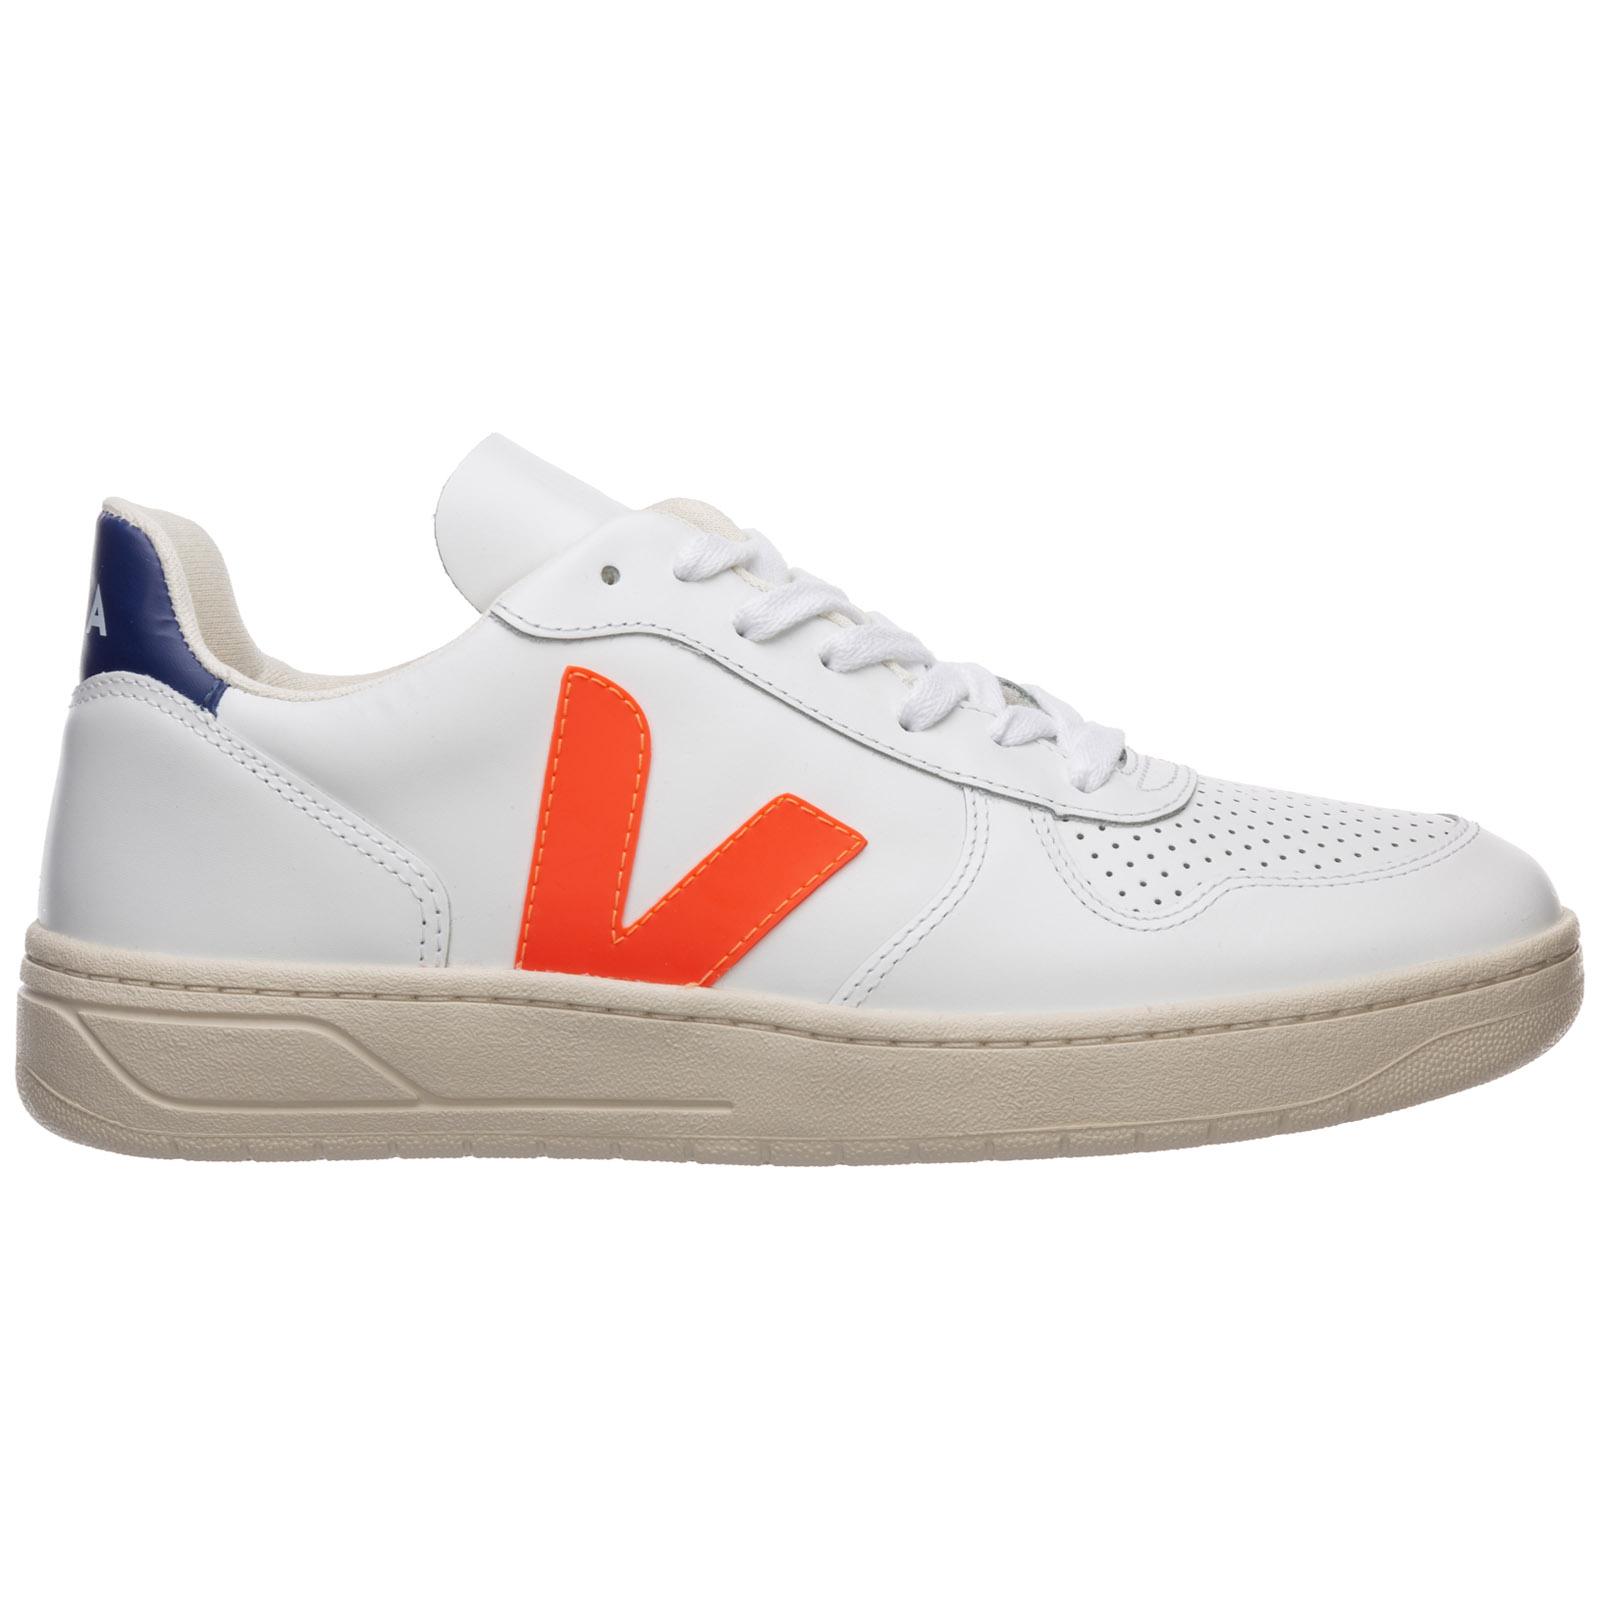 Sneakers Veja v-10 VX022136 extra white